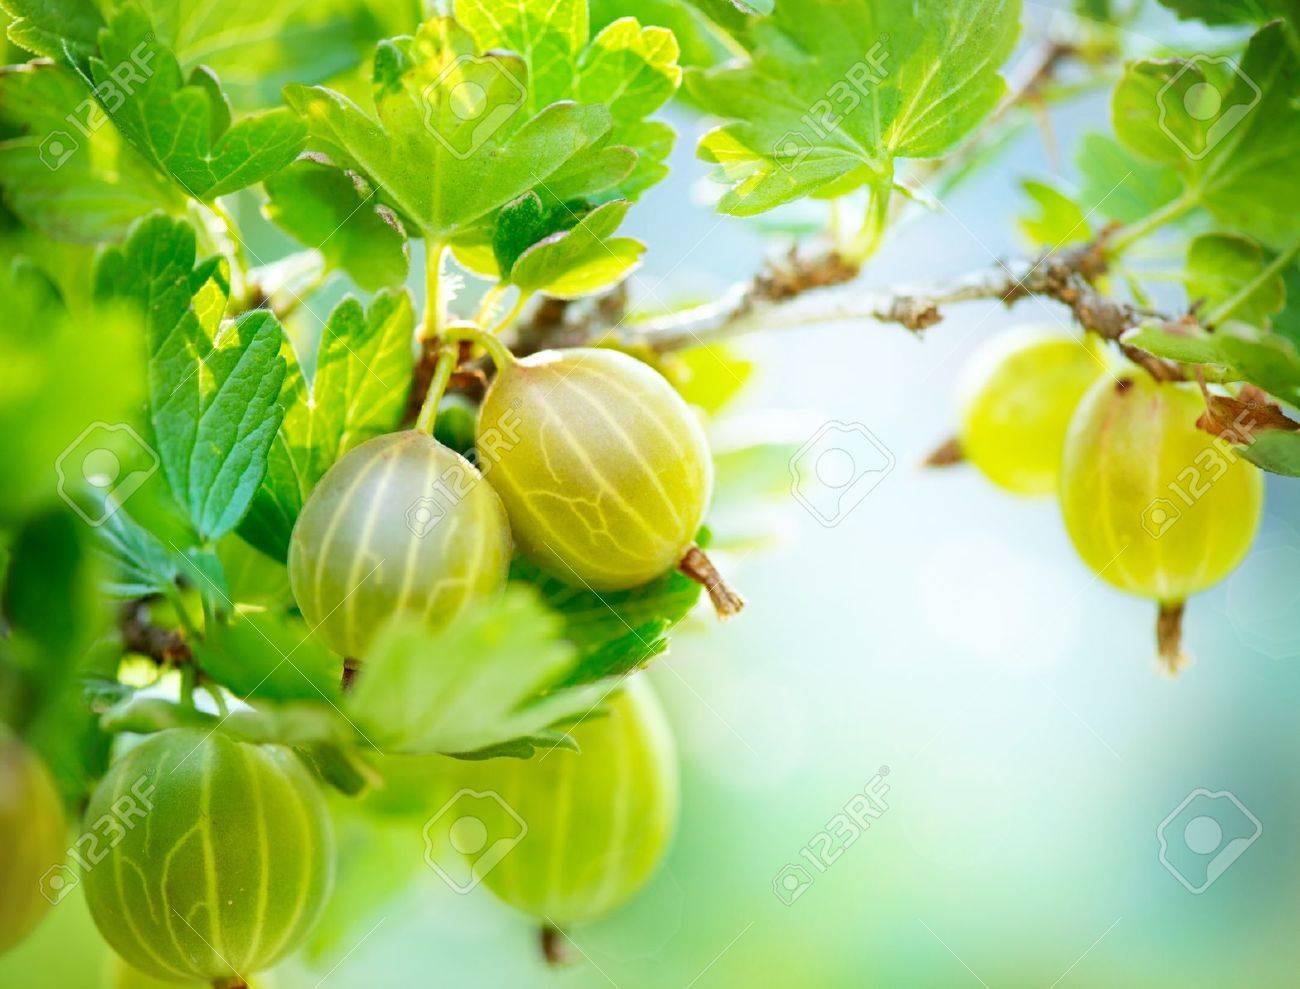 Gooseberry  Fresh and Ripe Organic Gooseberries Growing Stock Photo - 20651039